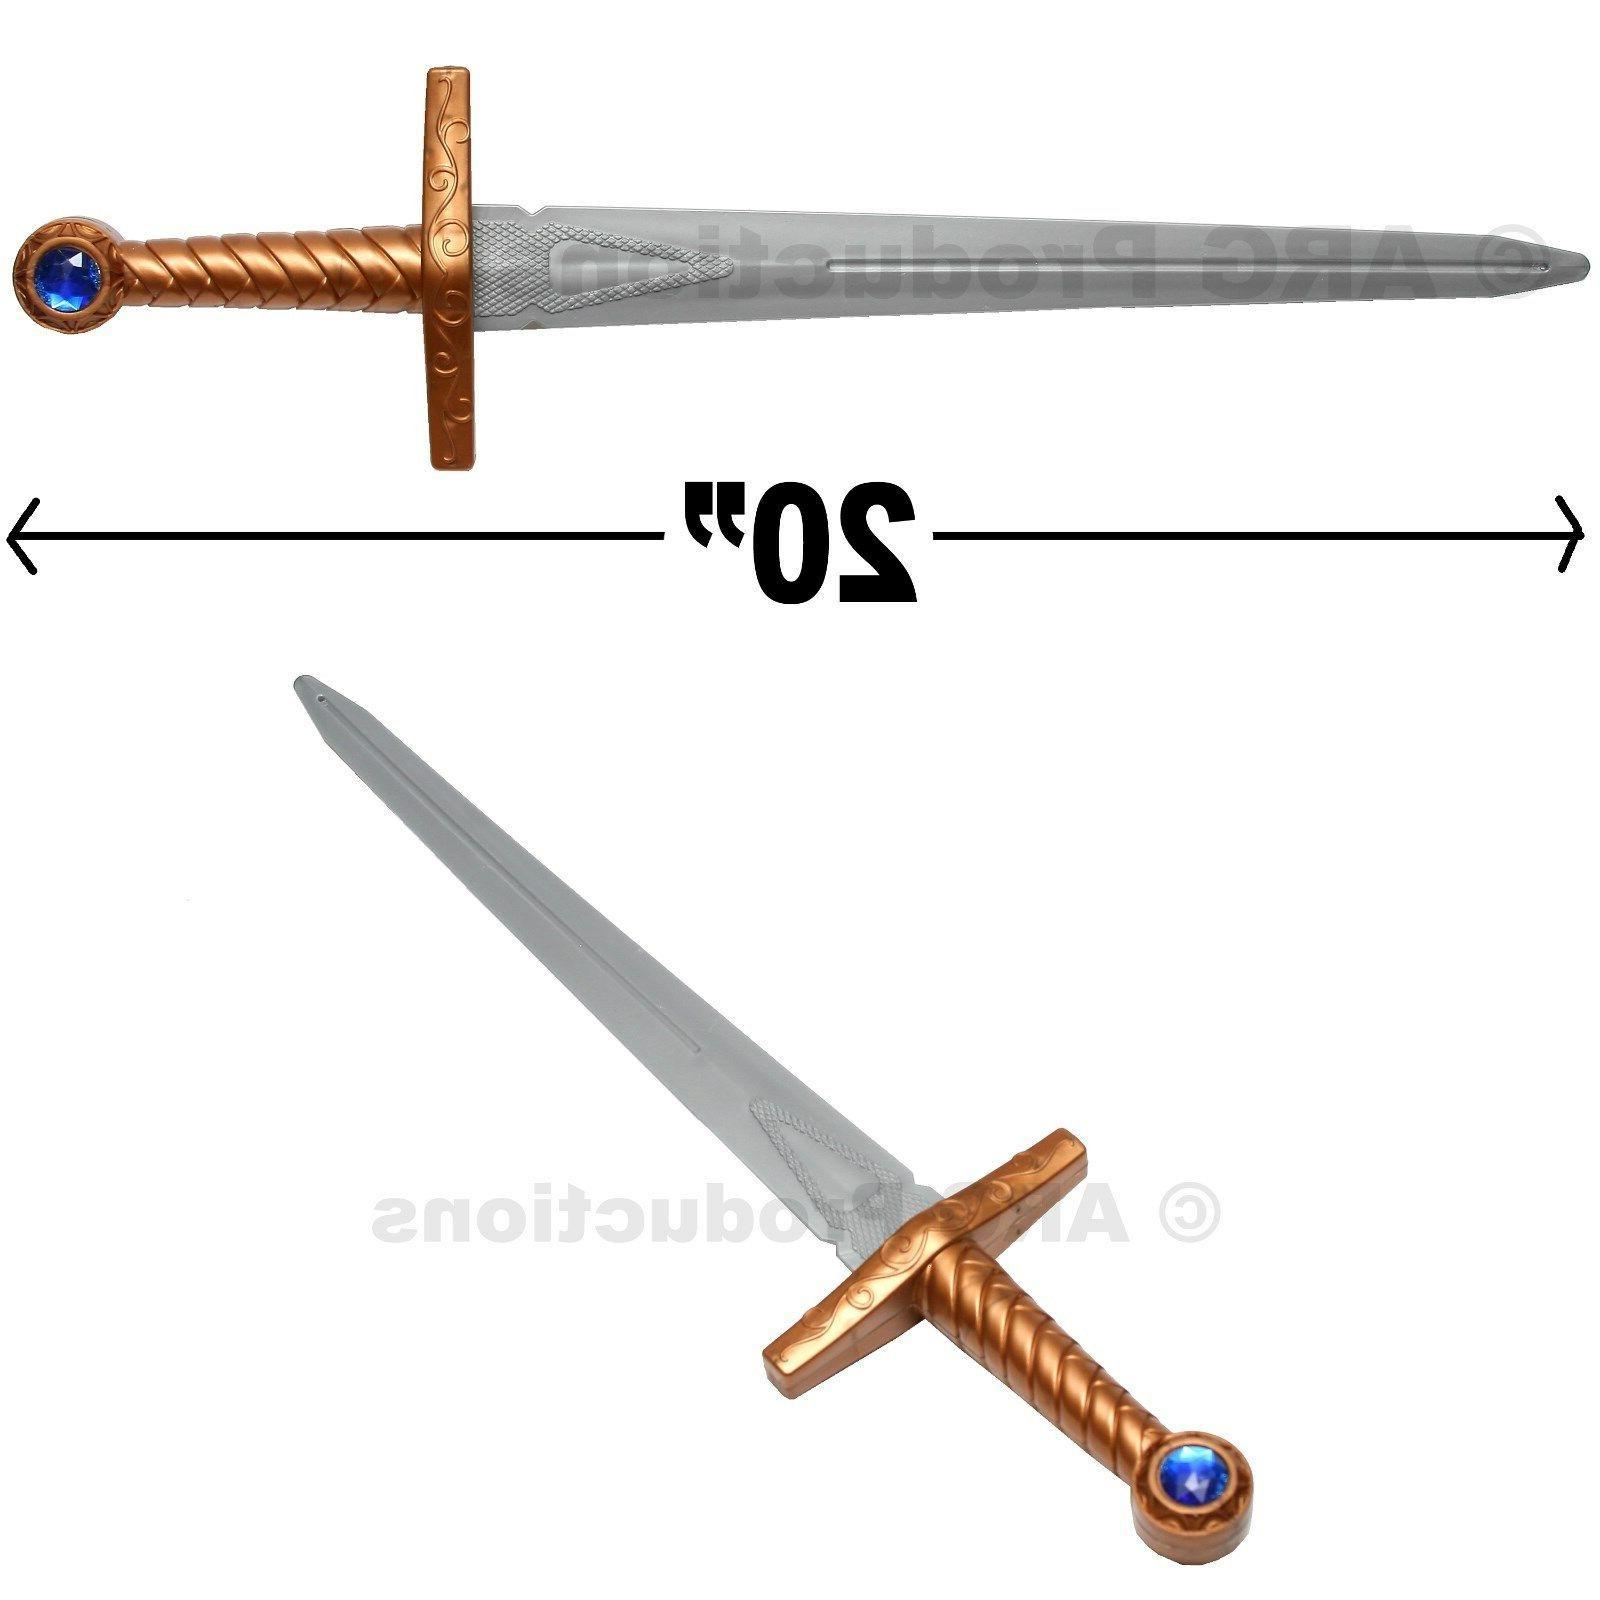 halloween knight sword costume accessory